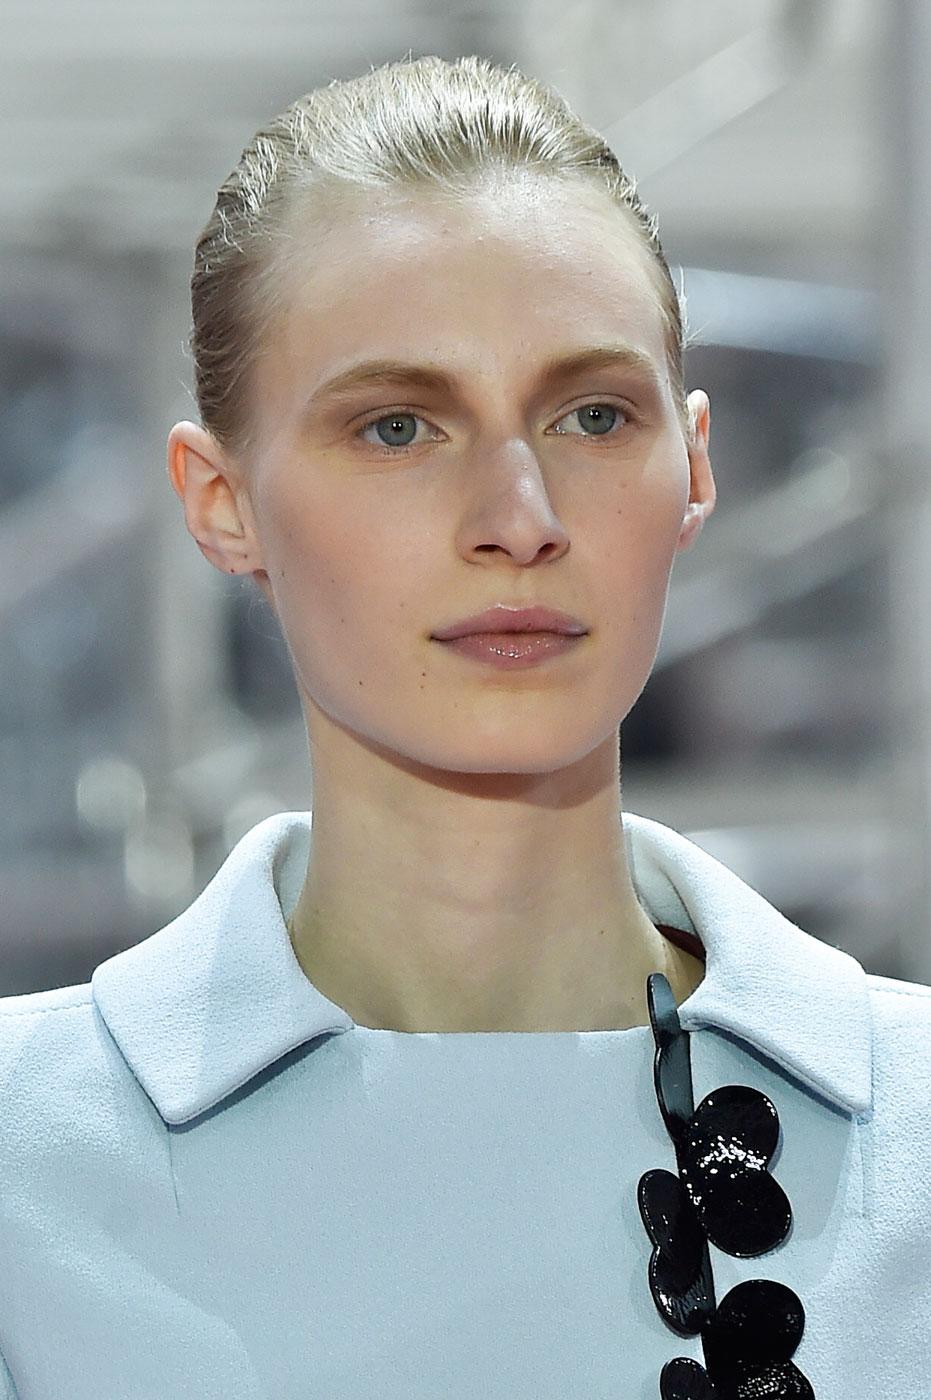 Christian-Dior-fashion-runway-show-close-ups-haute-couture-paris-spring-summer-2015-the-impression-022